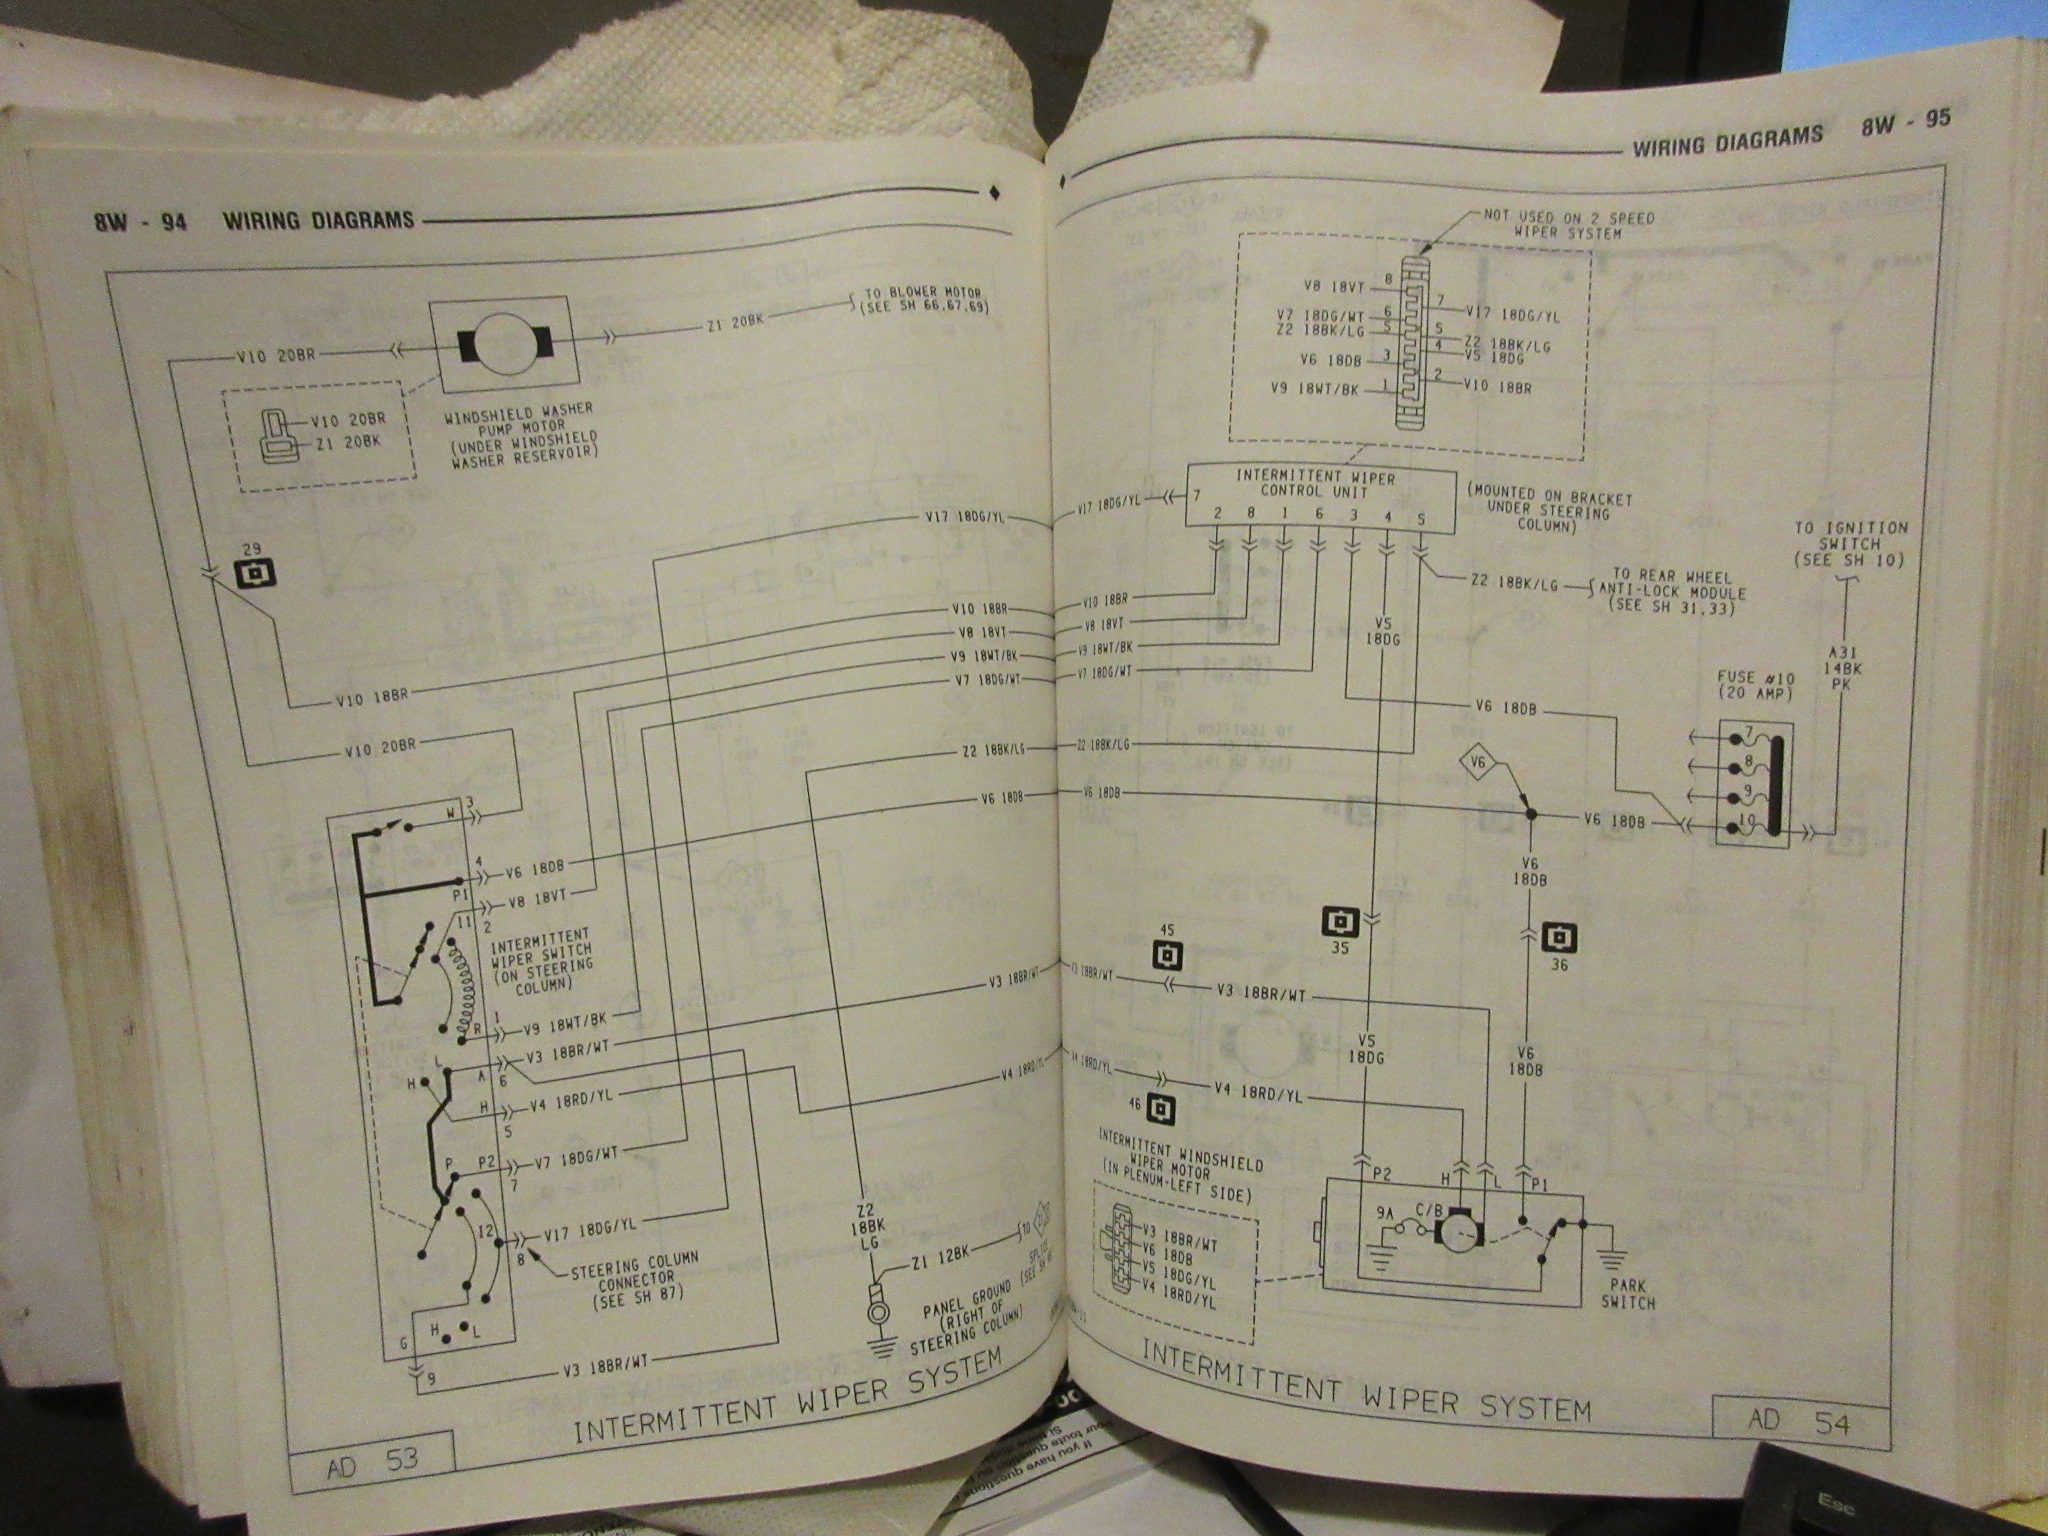 steering column wiring diagrams | Dodge Ram Cummins Diesels and MoparDodge Ram Cummins Diesels and Mopar